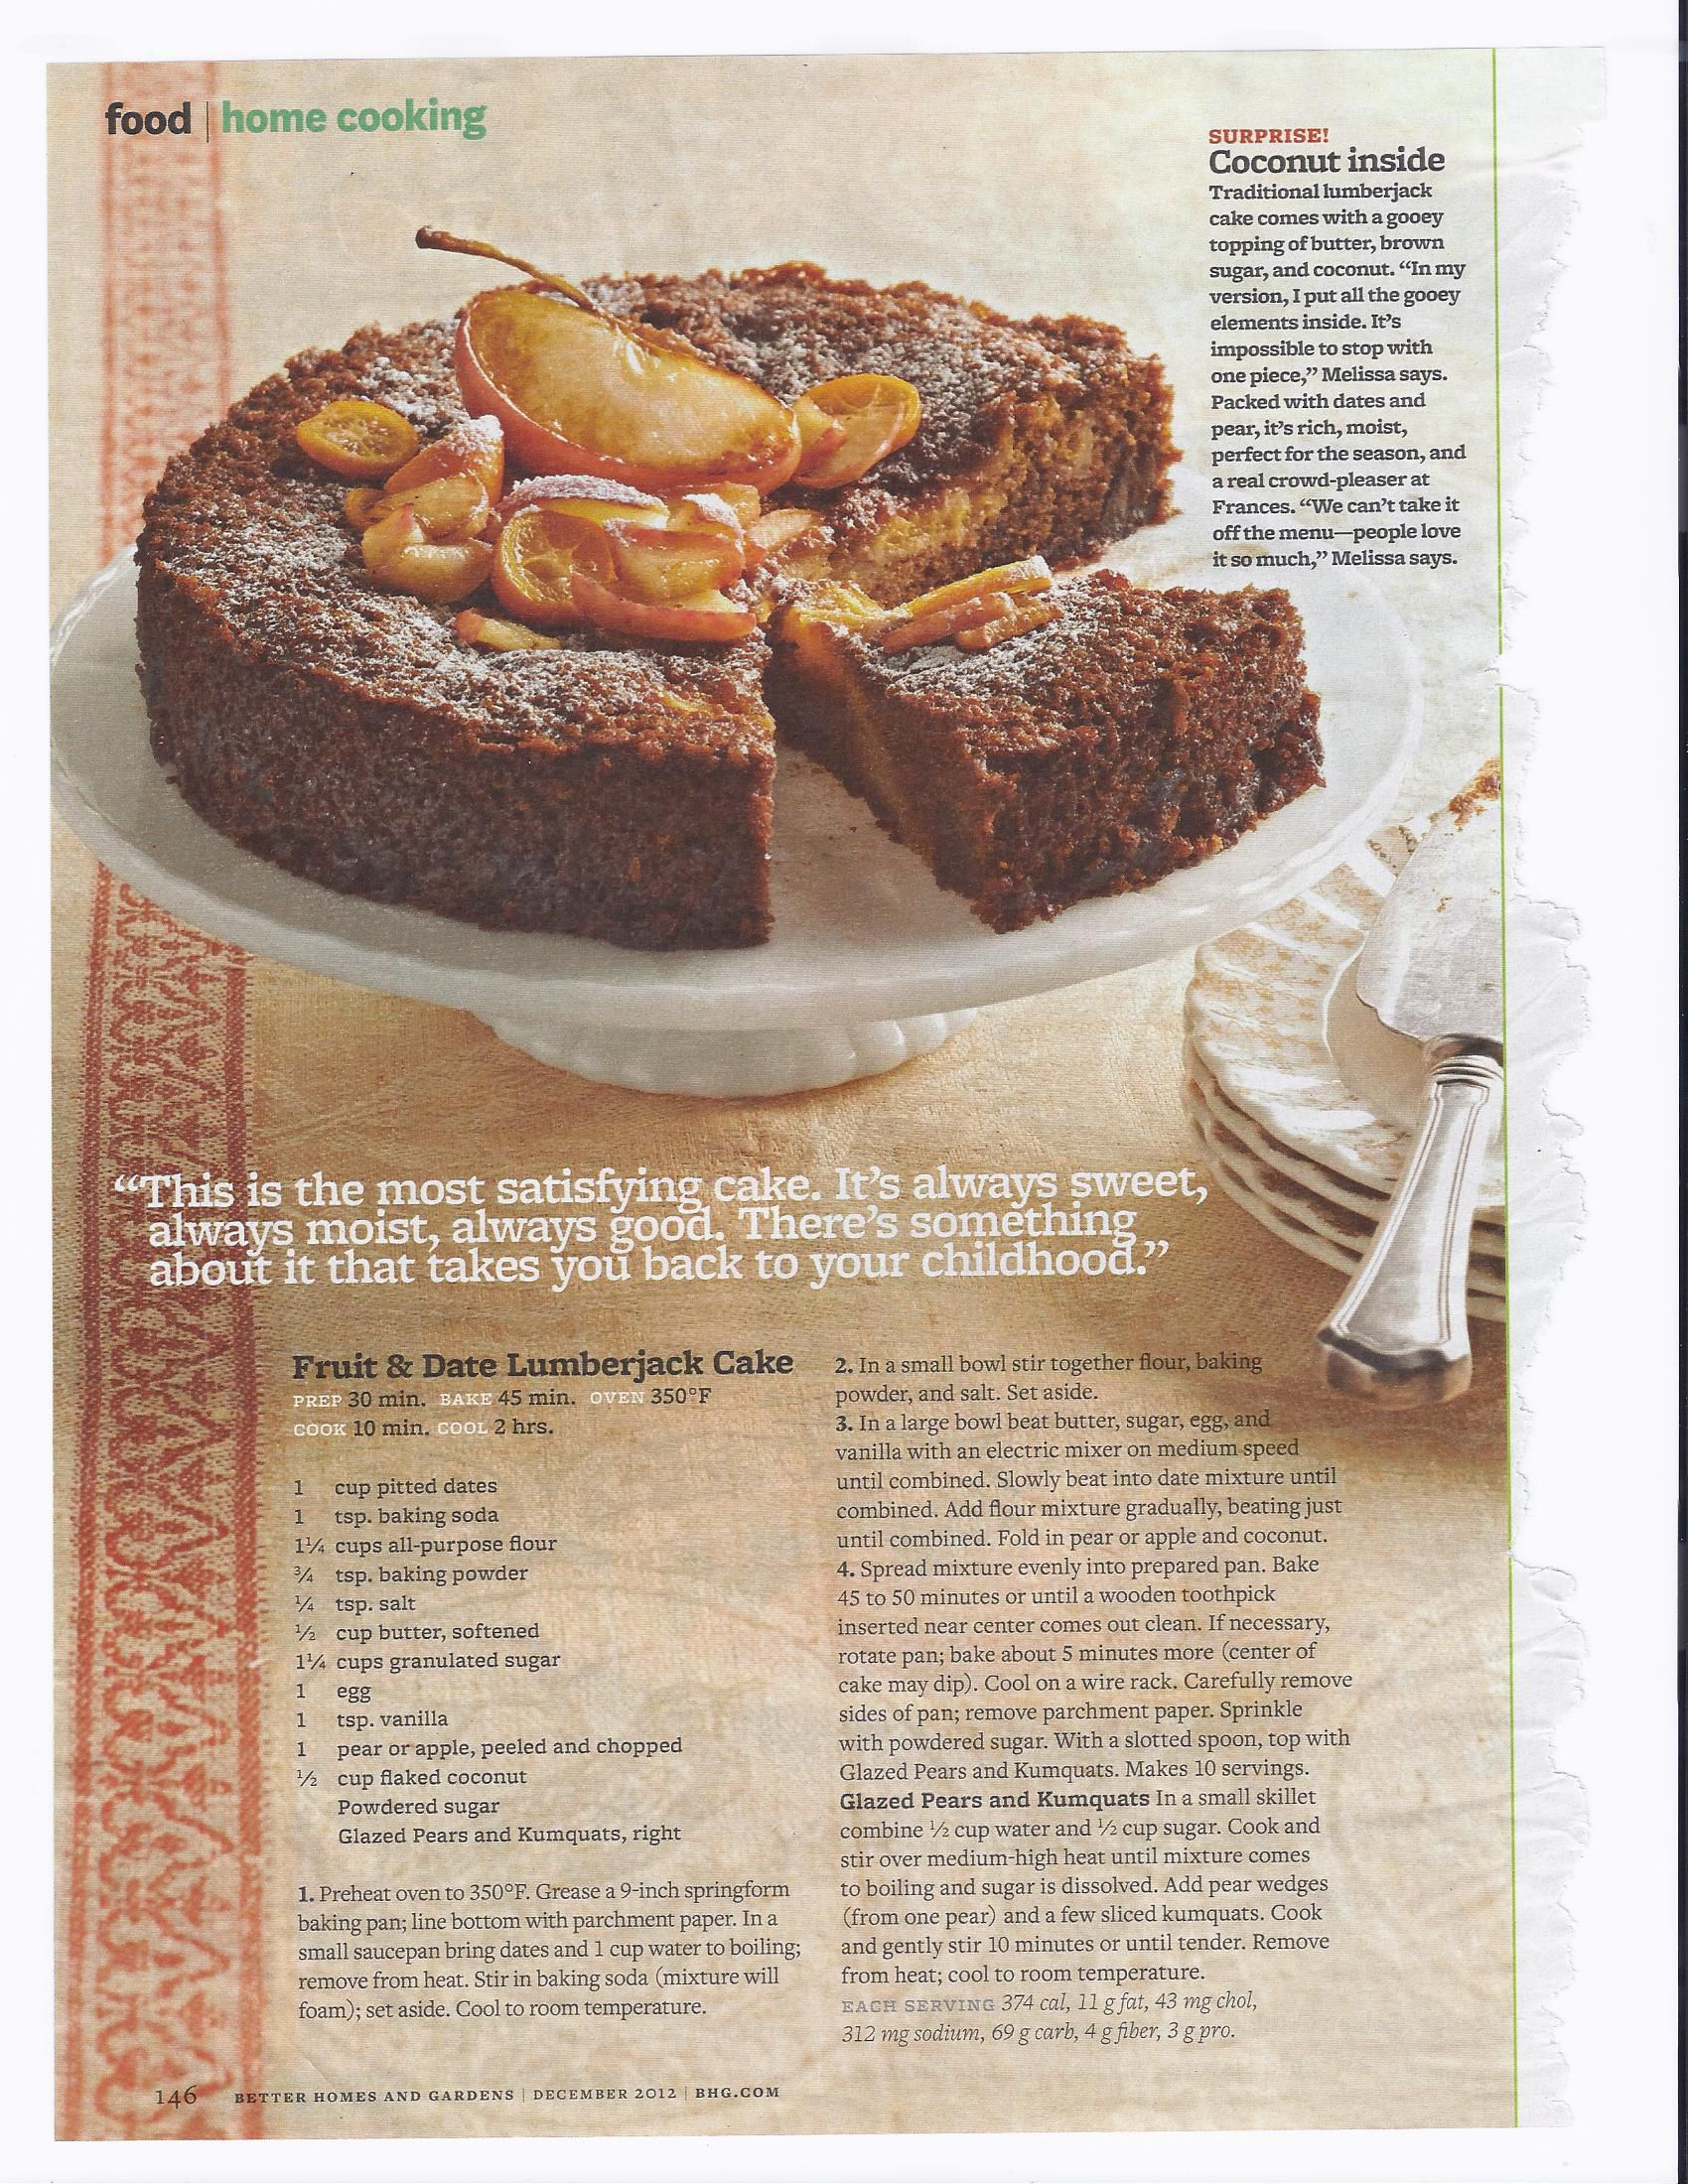 e1b3ba51e16a02ab12111507e3cff1ee - Lumberjack Cake Better Homes And Gardens